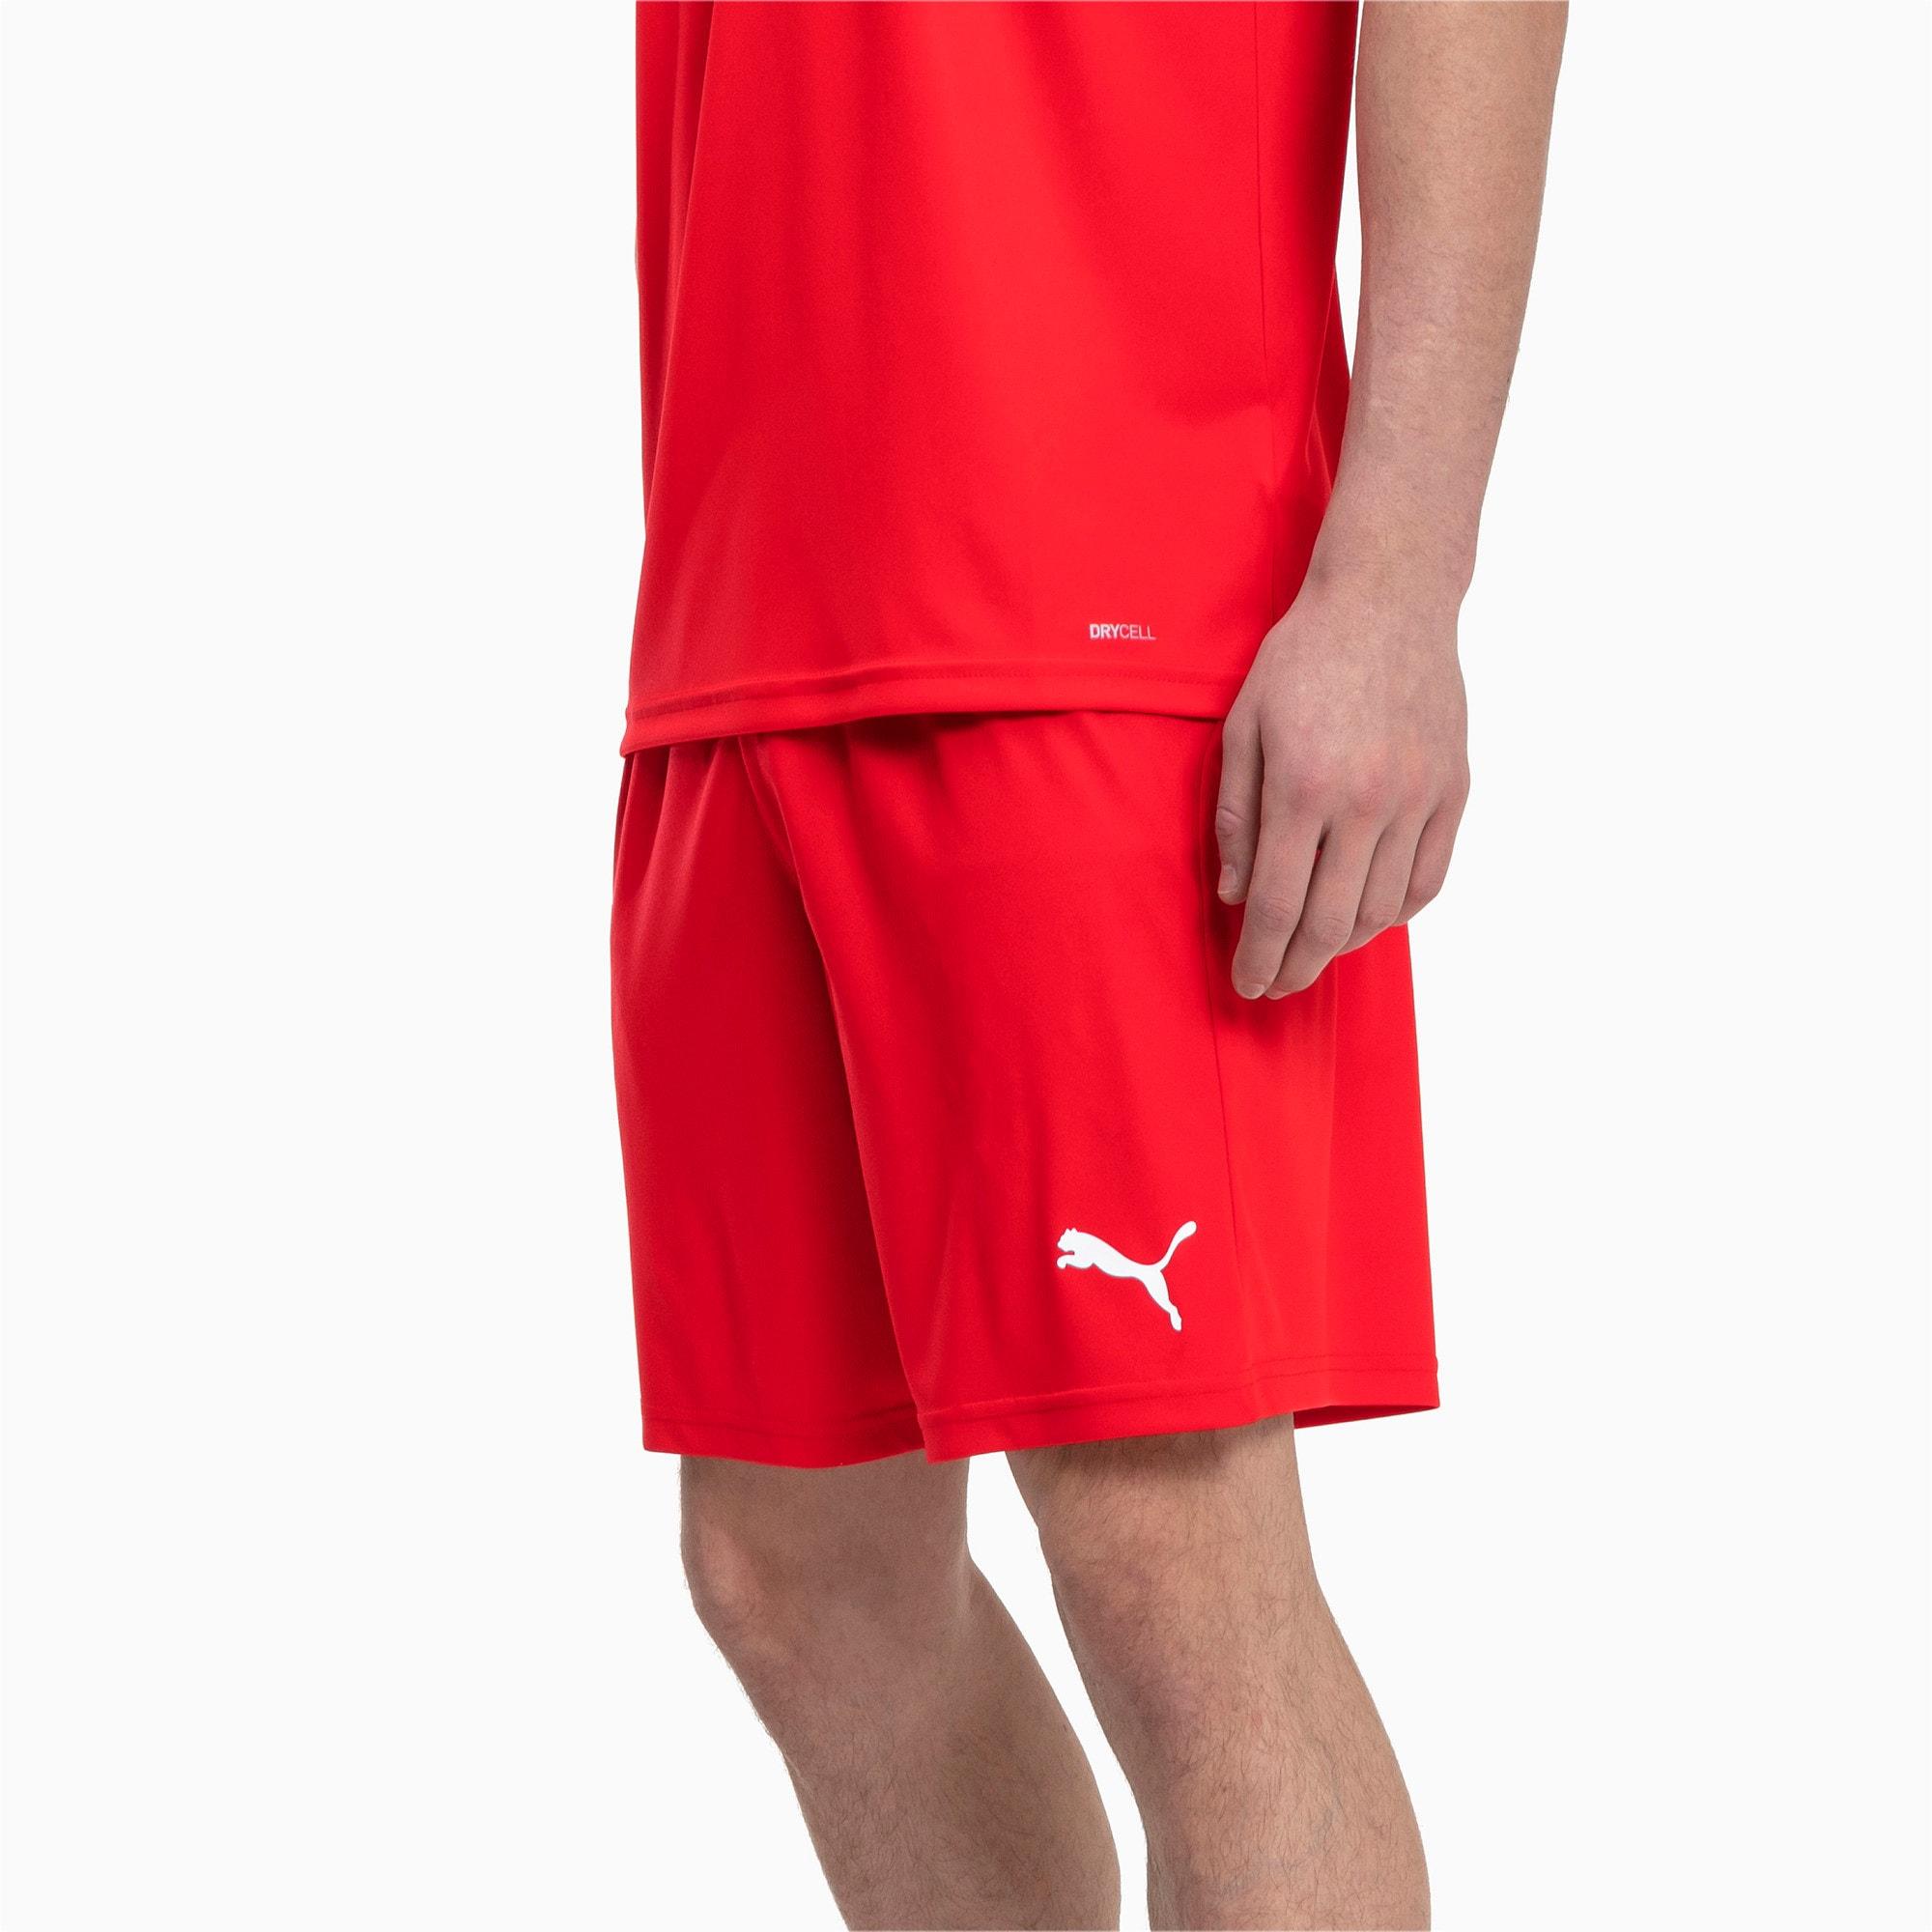 Thumbnail 1 of Liga Core Men's Shorts, Puma Red-Puma White, medium